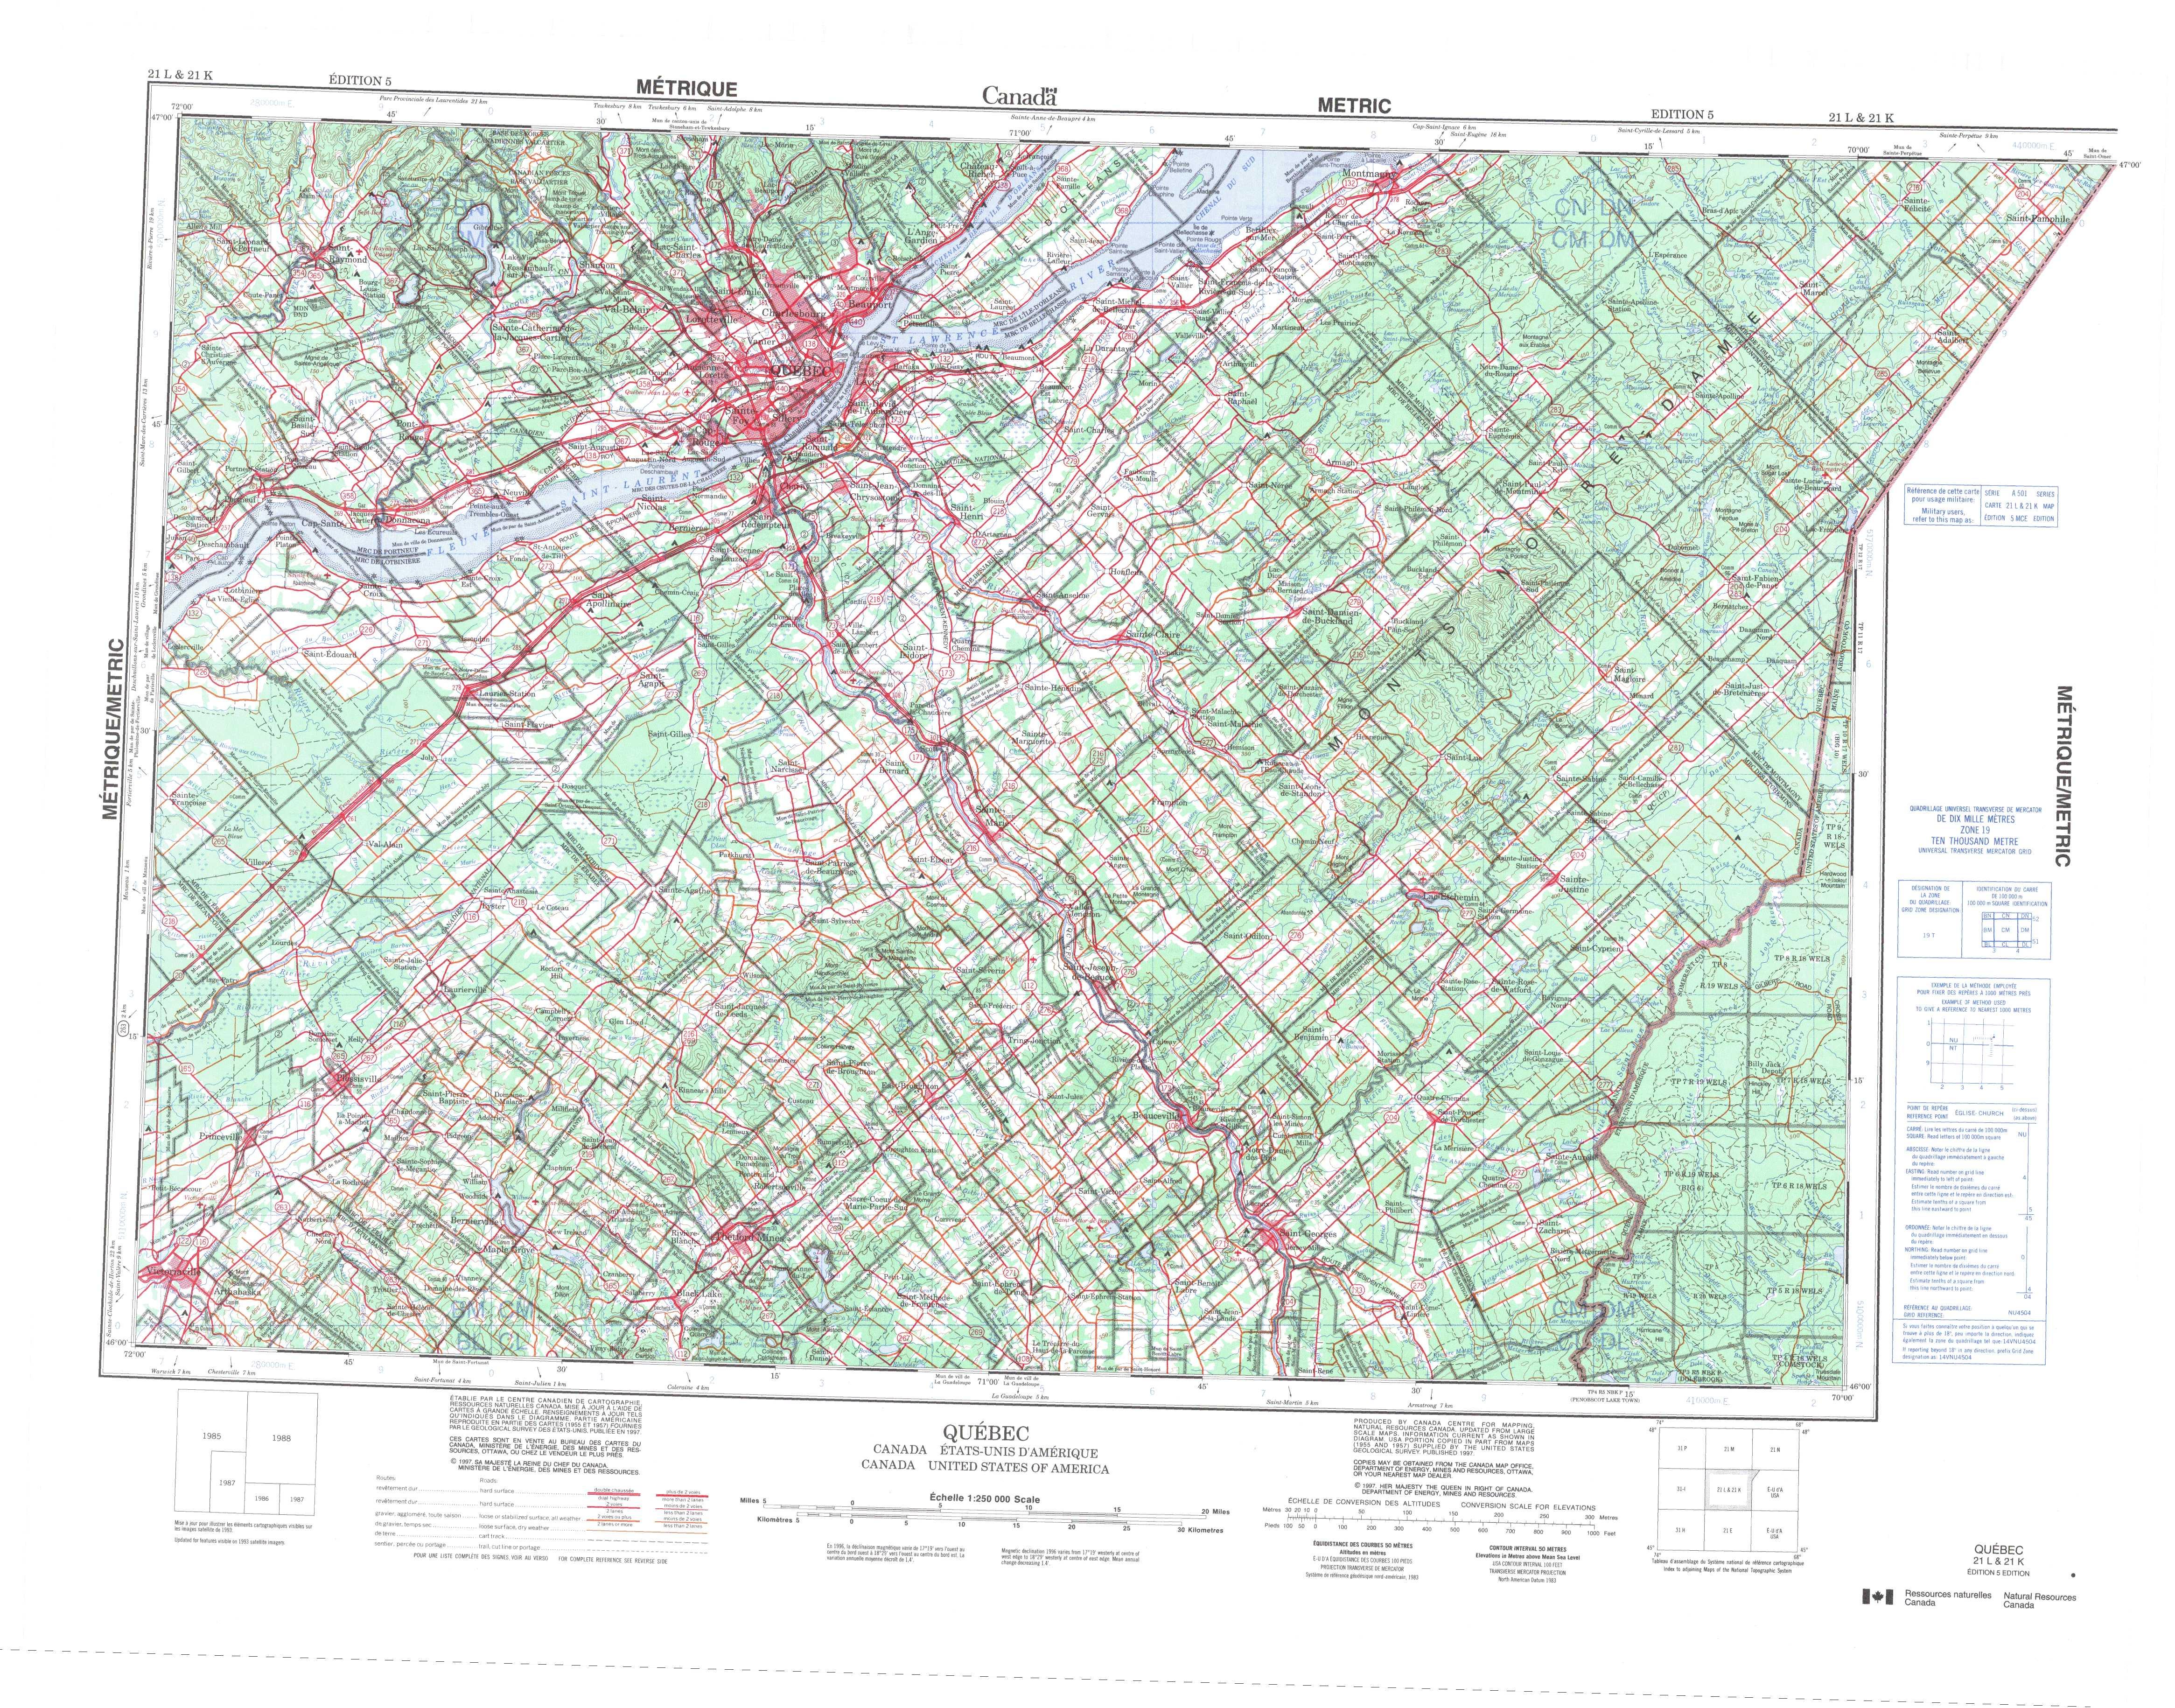 Printable Topographic Map Of Quebec 021L, Qc - Free Printable Topo Maps